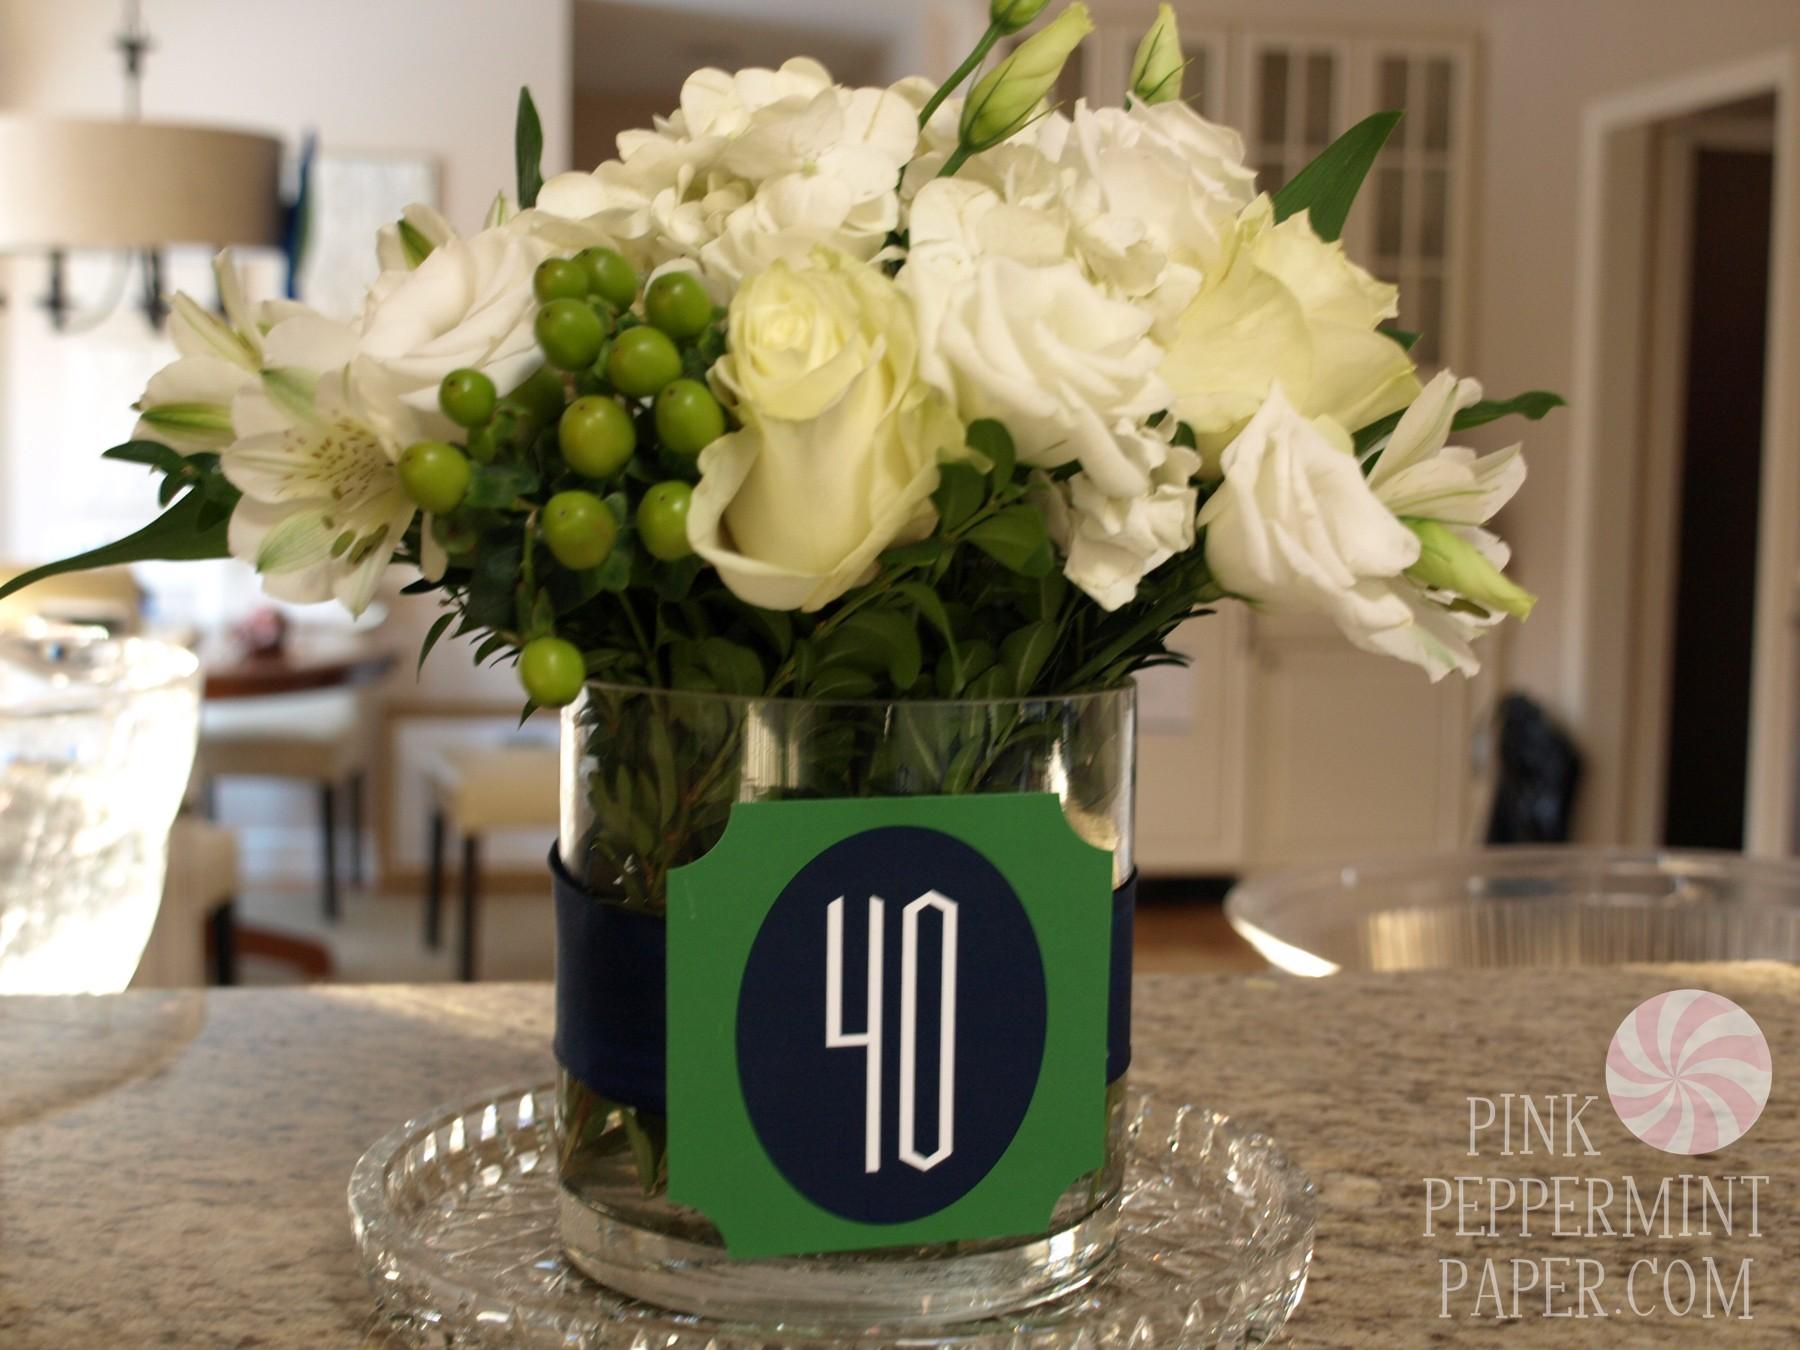 Best flowers for 70th birthday same day flower delivery another picture of best flowers for 70th birthday izmirmasajfo